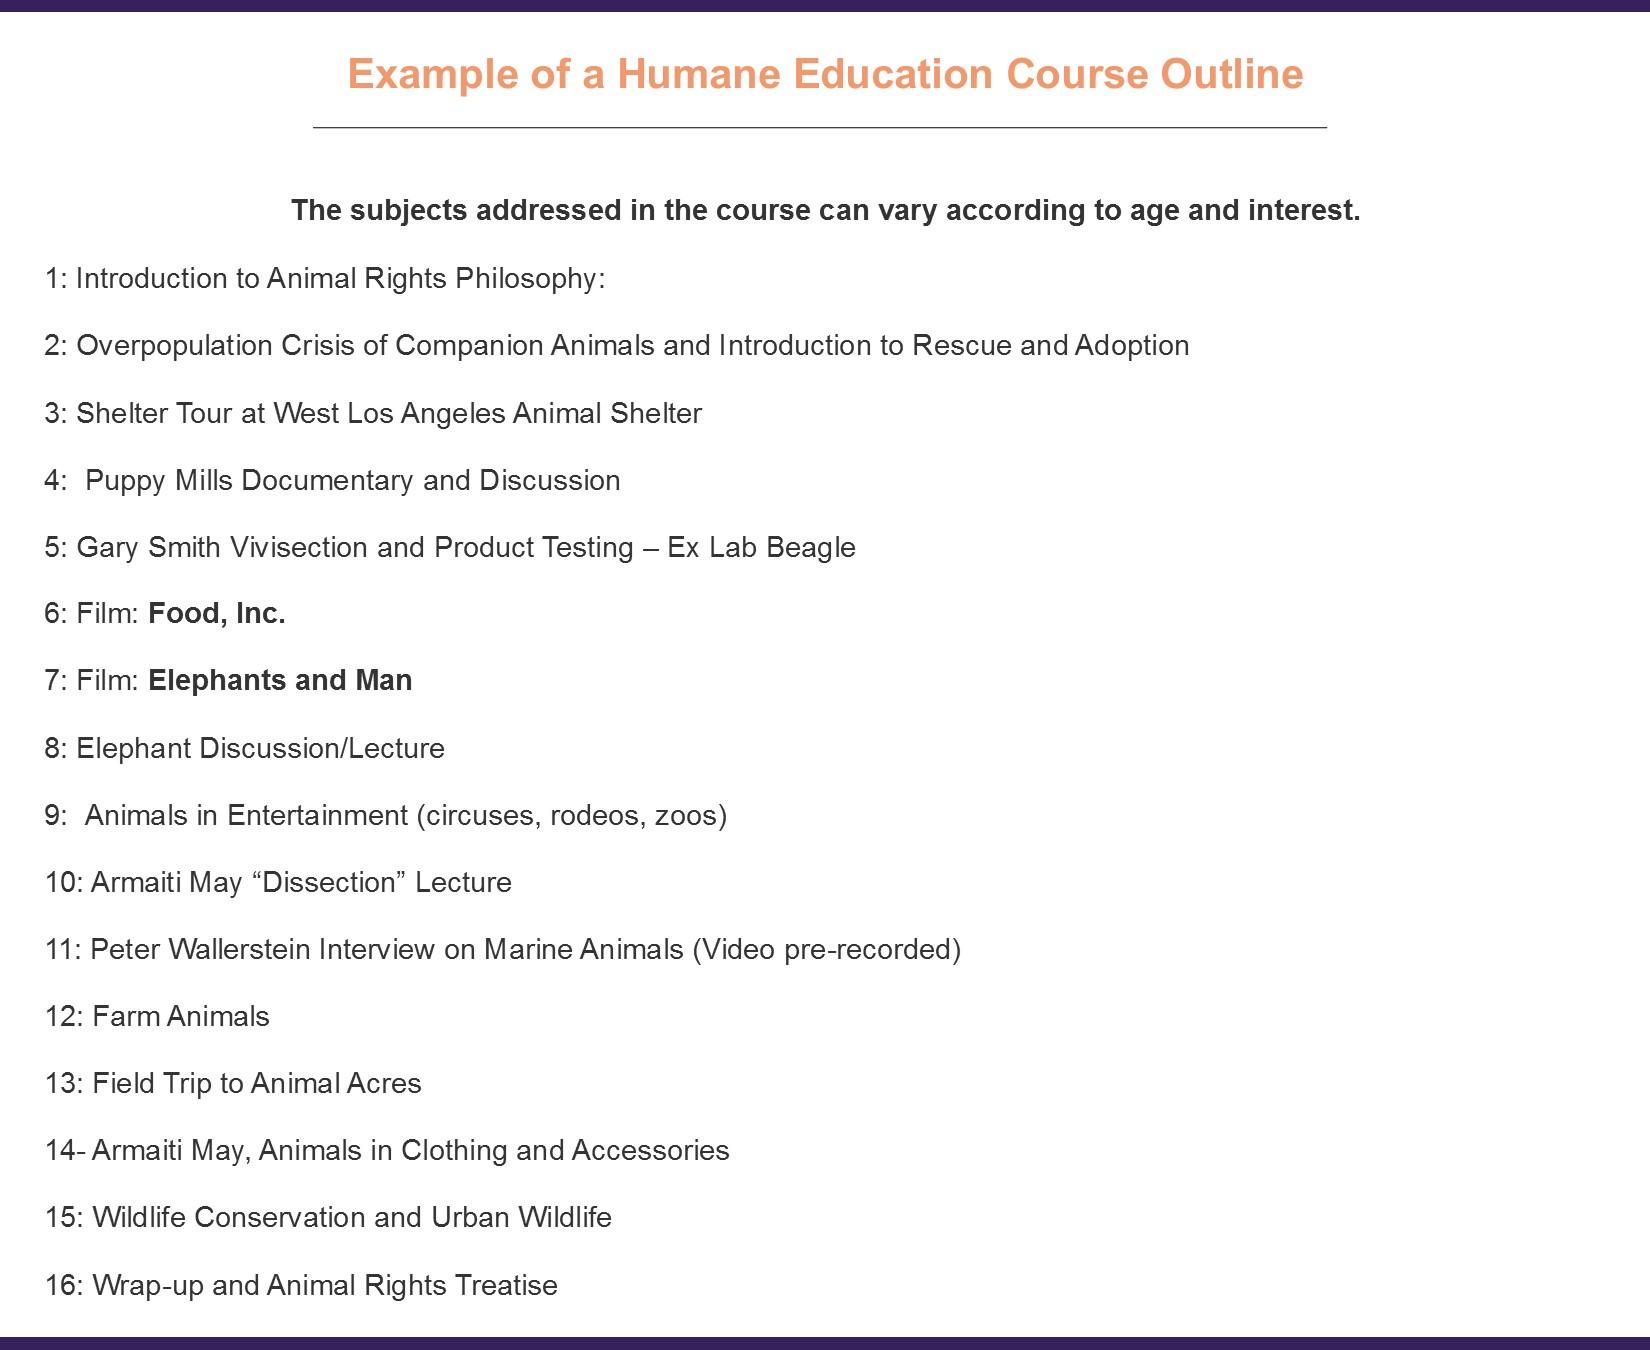 Course_Outline.jpg